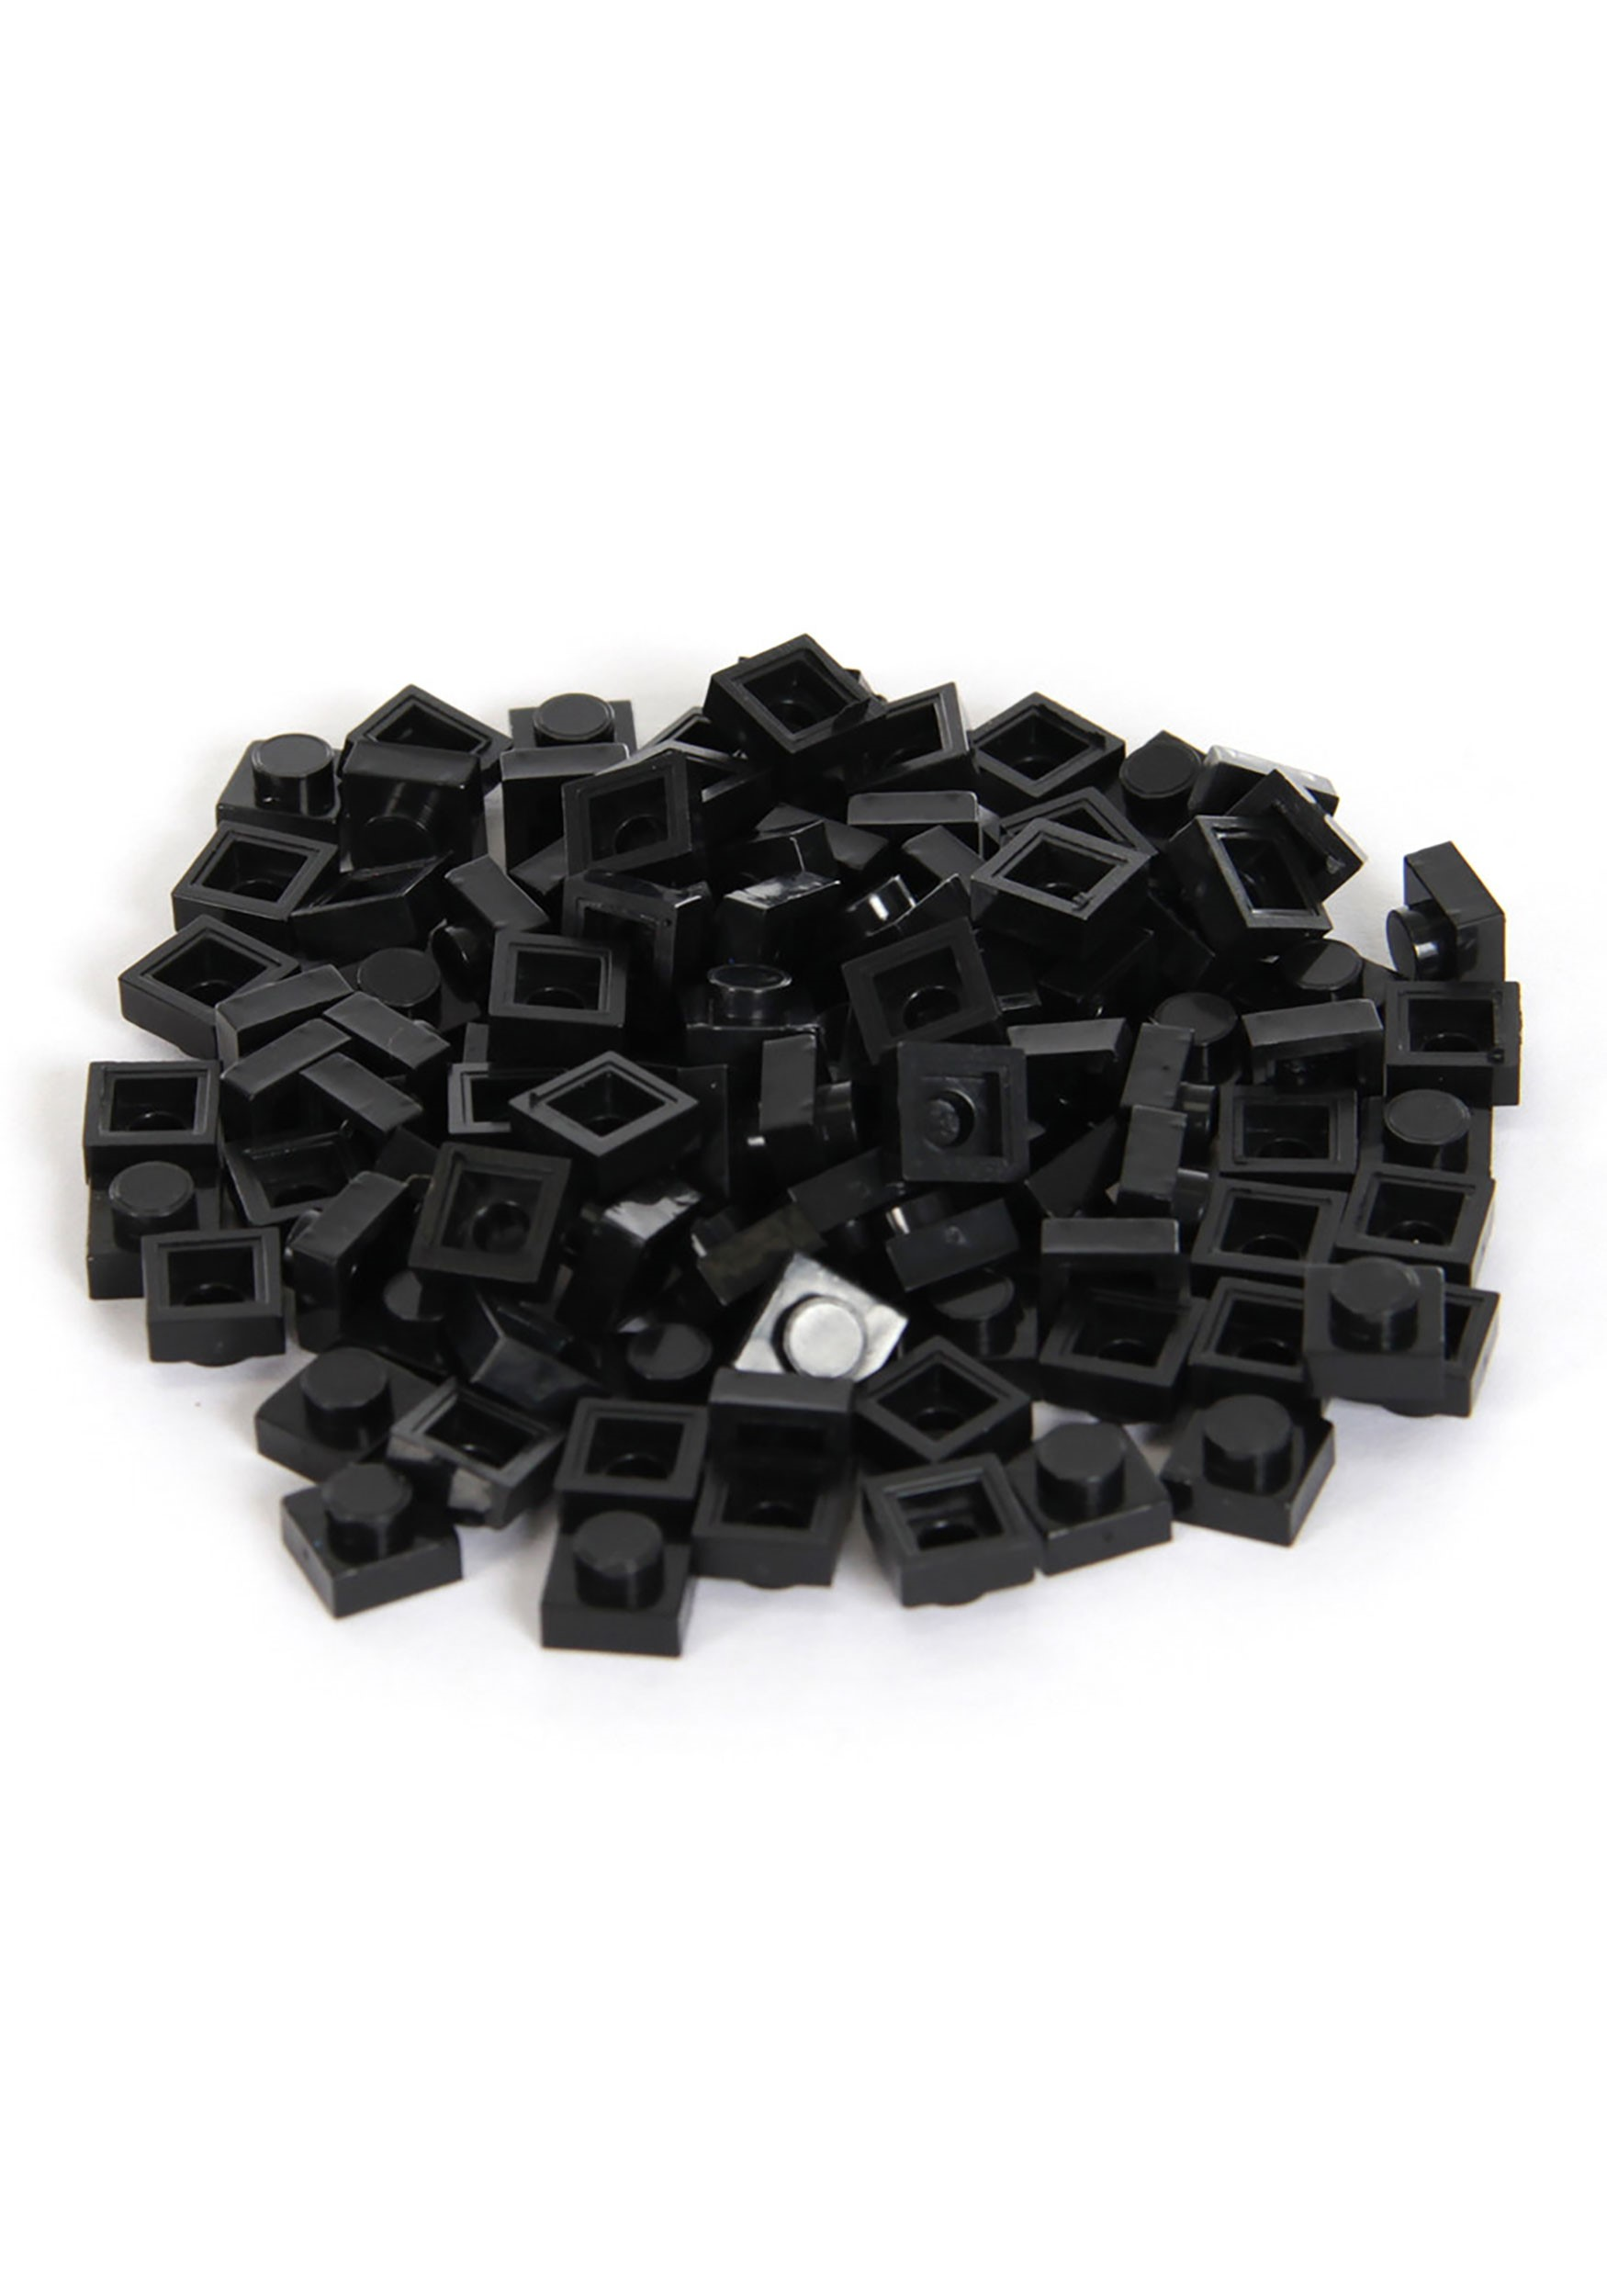 Black Bricky Blocks 100 Pieces 1x1